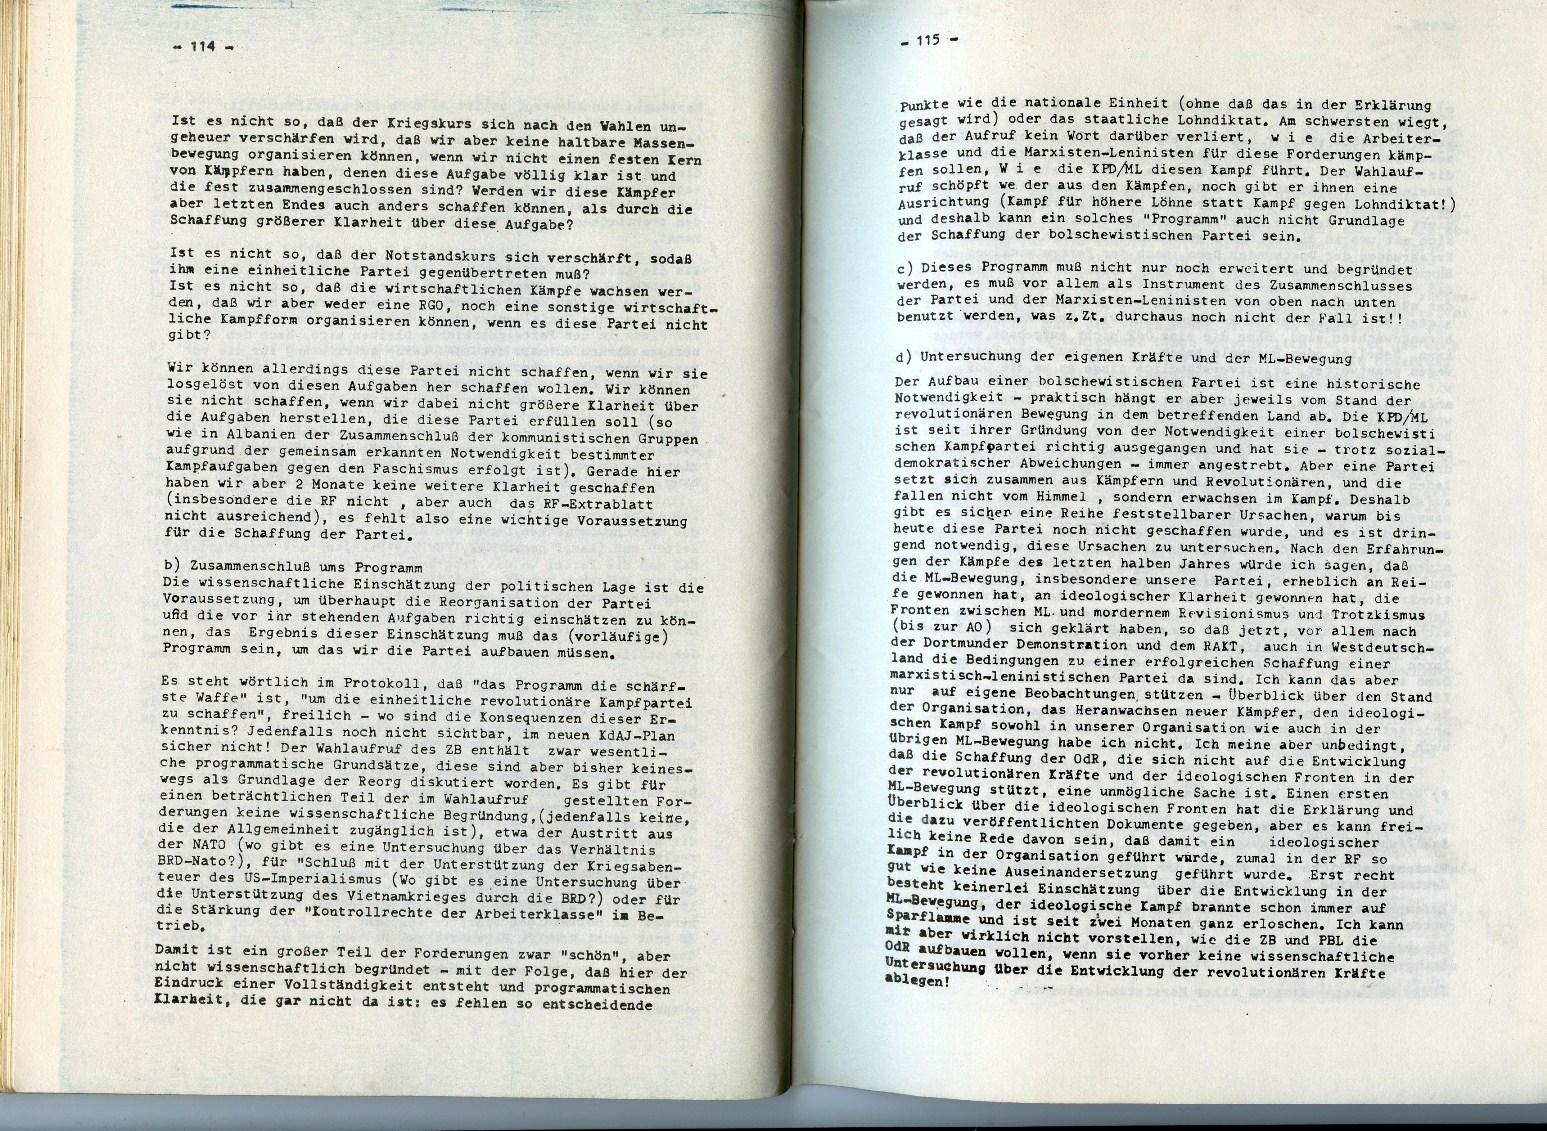 ZB_Universitas_1972_61